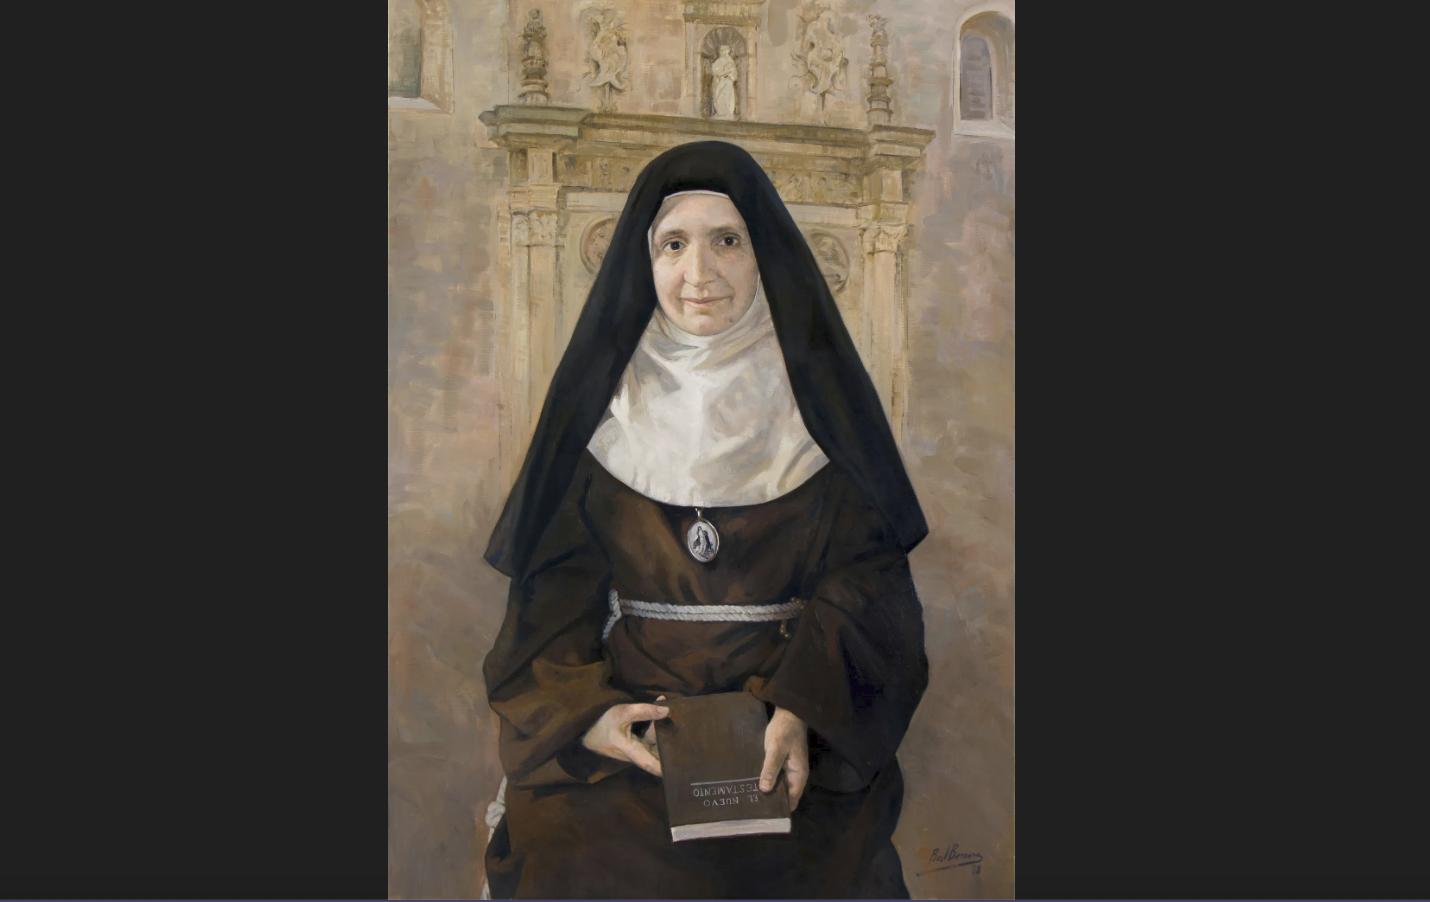 Francisca del Niño Jesus, capture @ ofm.org